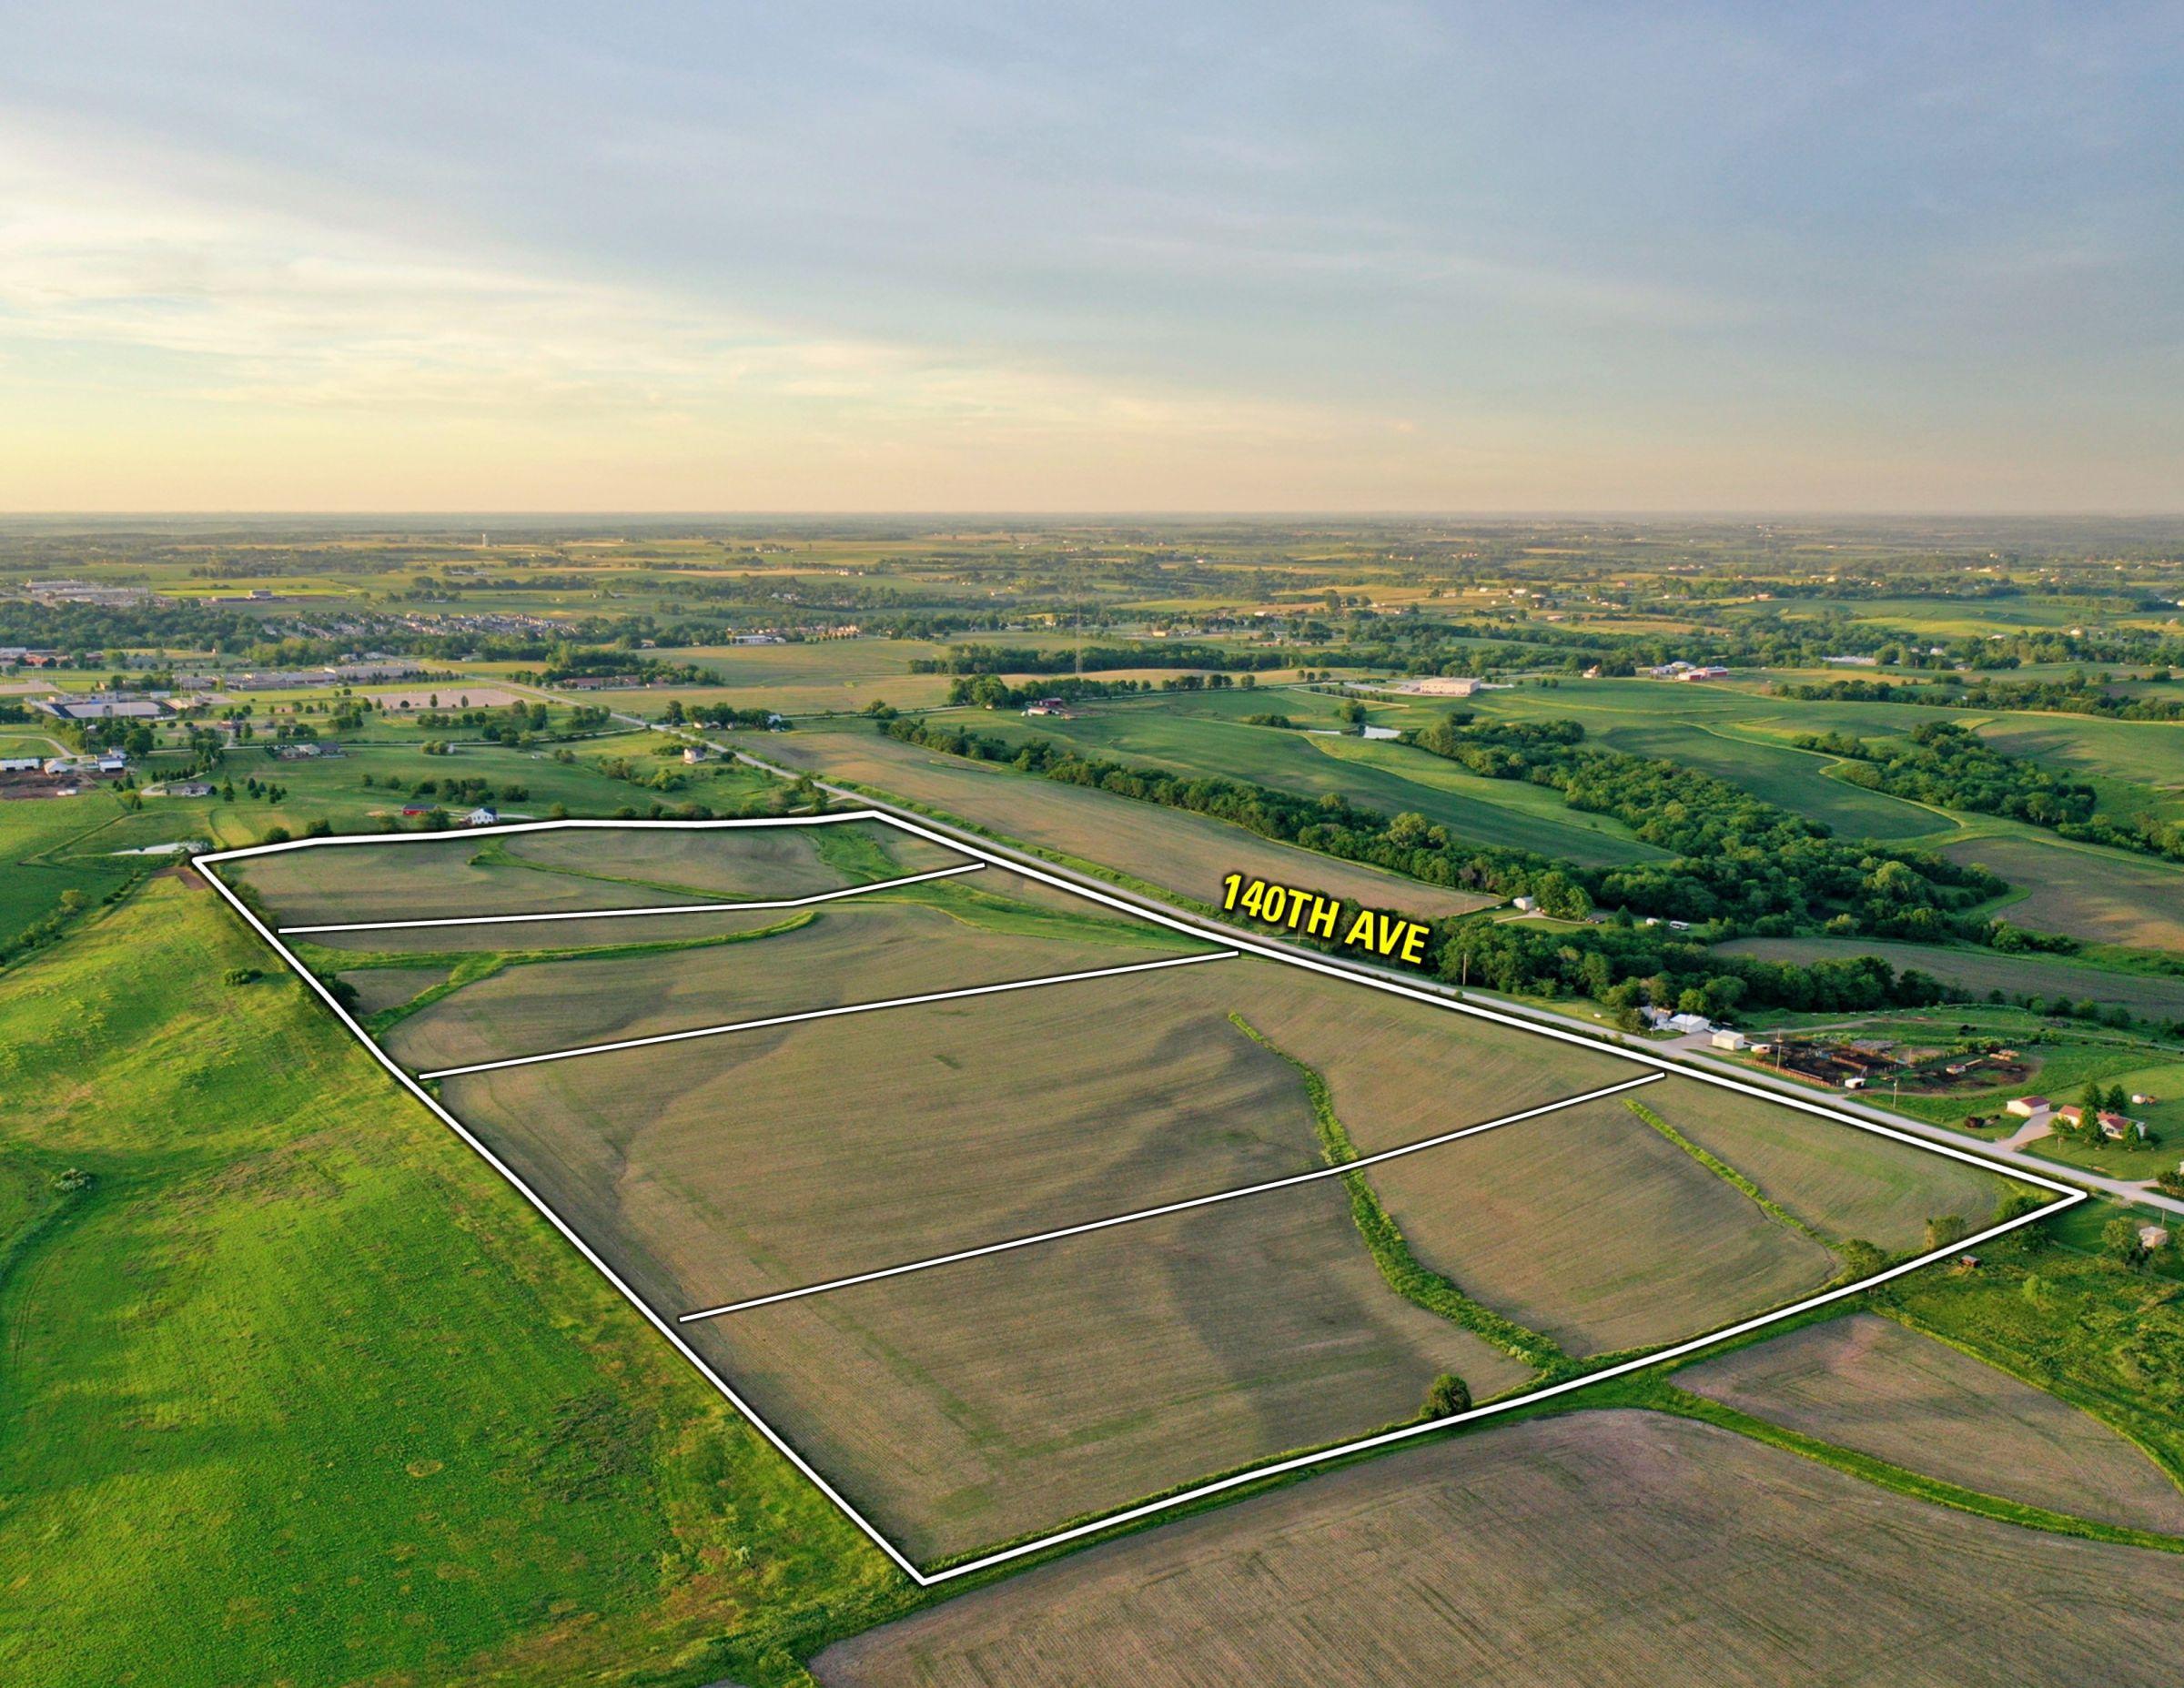 development-land-warren-county-iowa-20-acres-listing-number-15424-2-2021-03-26-185019.jpg